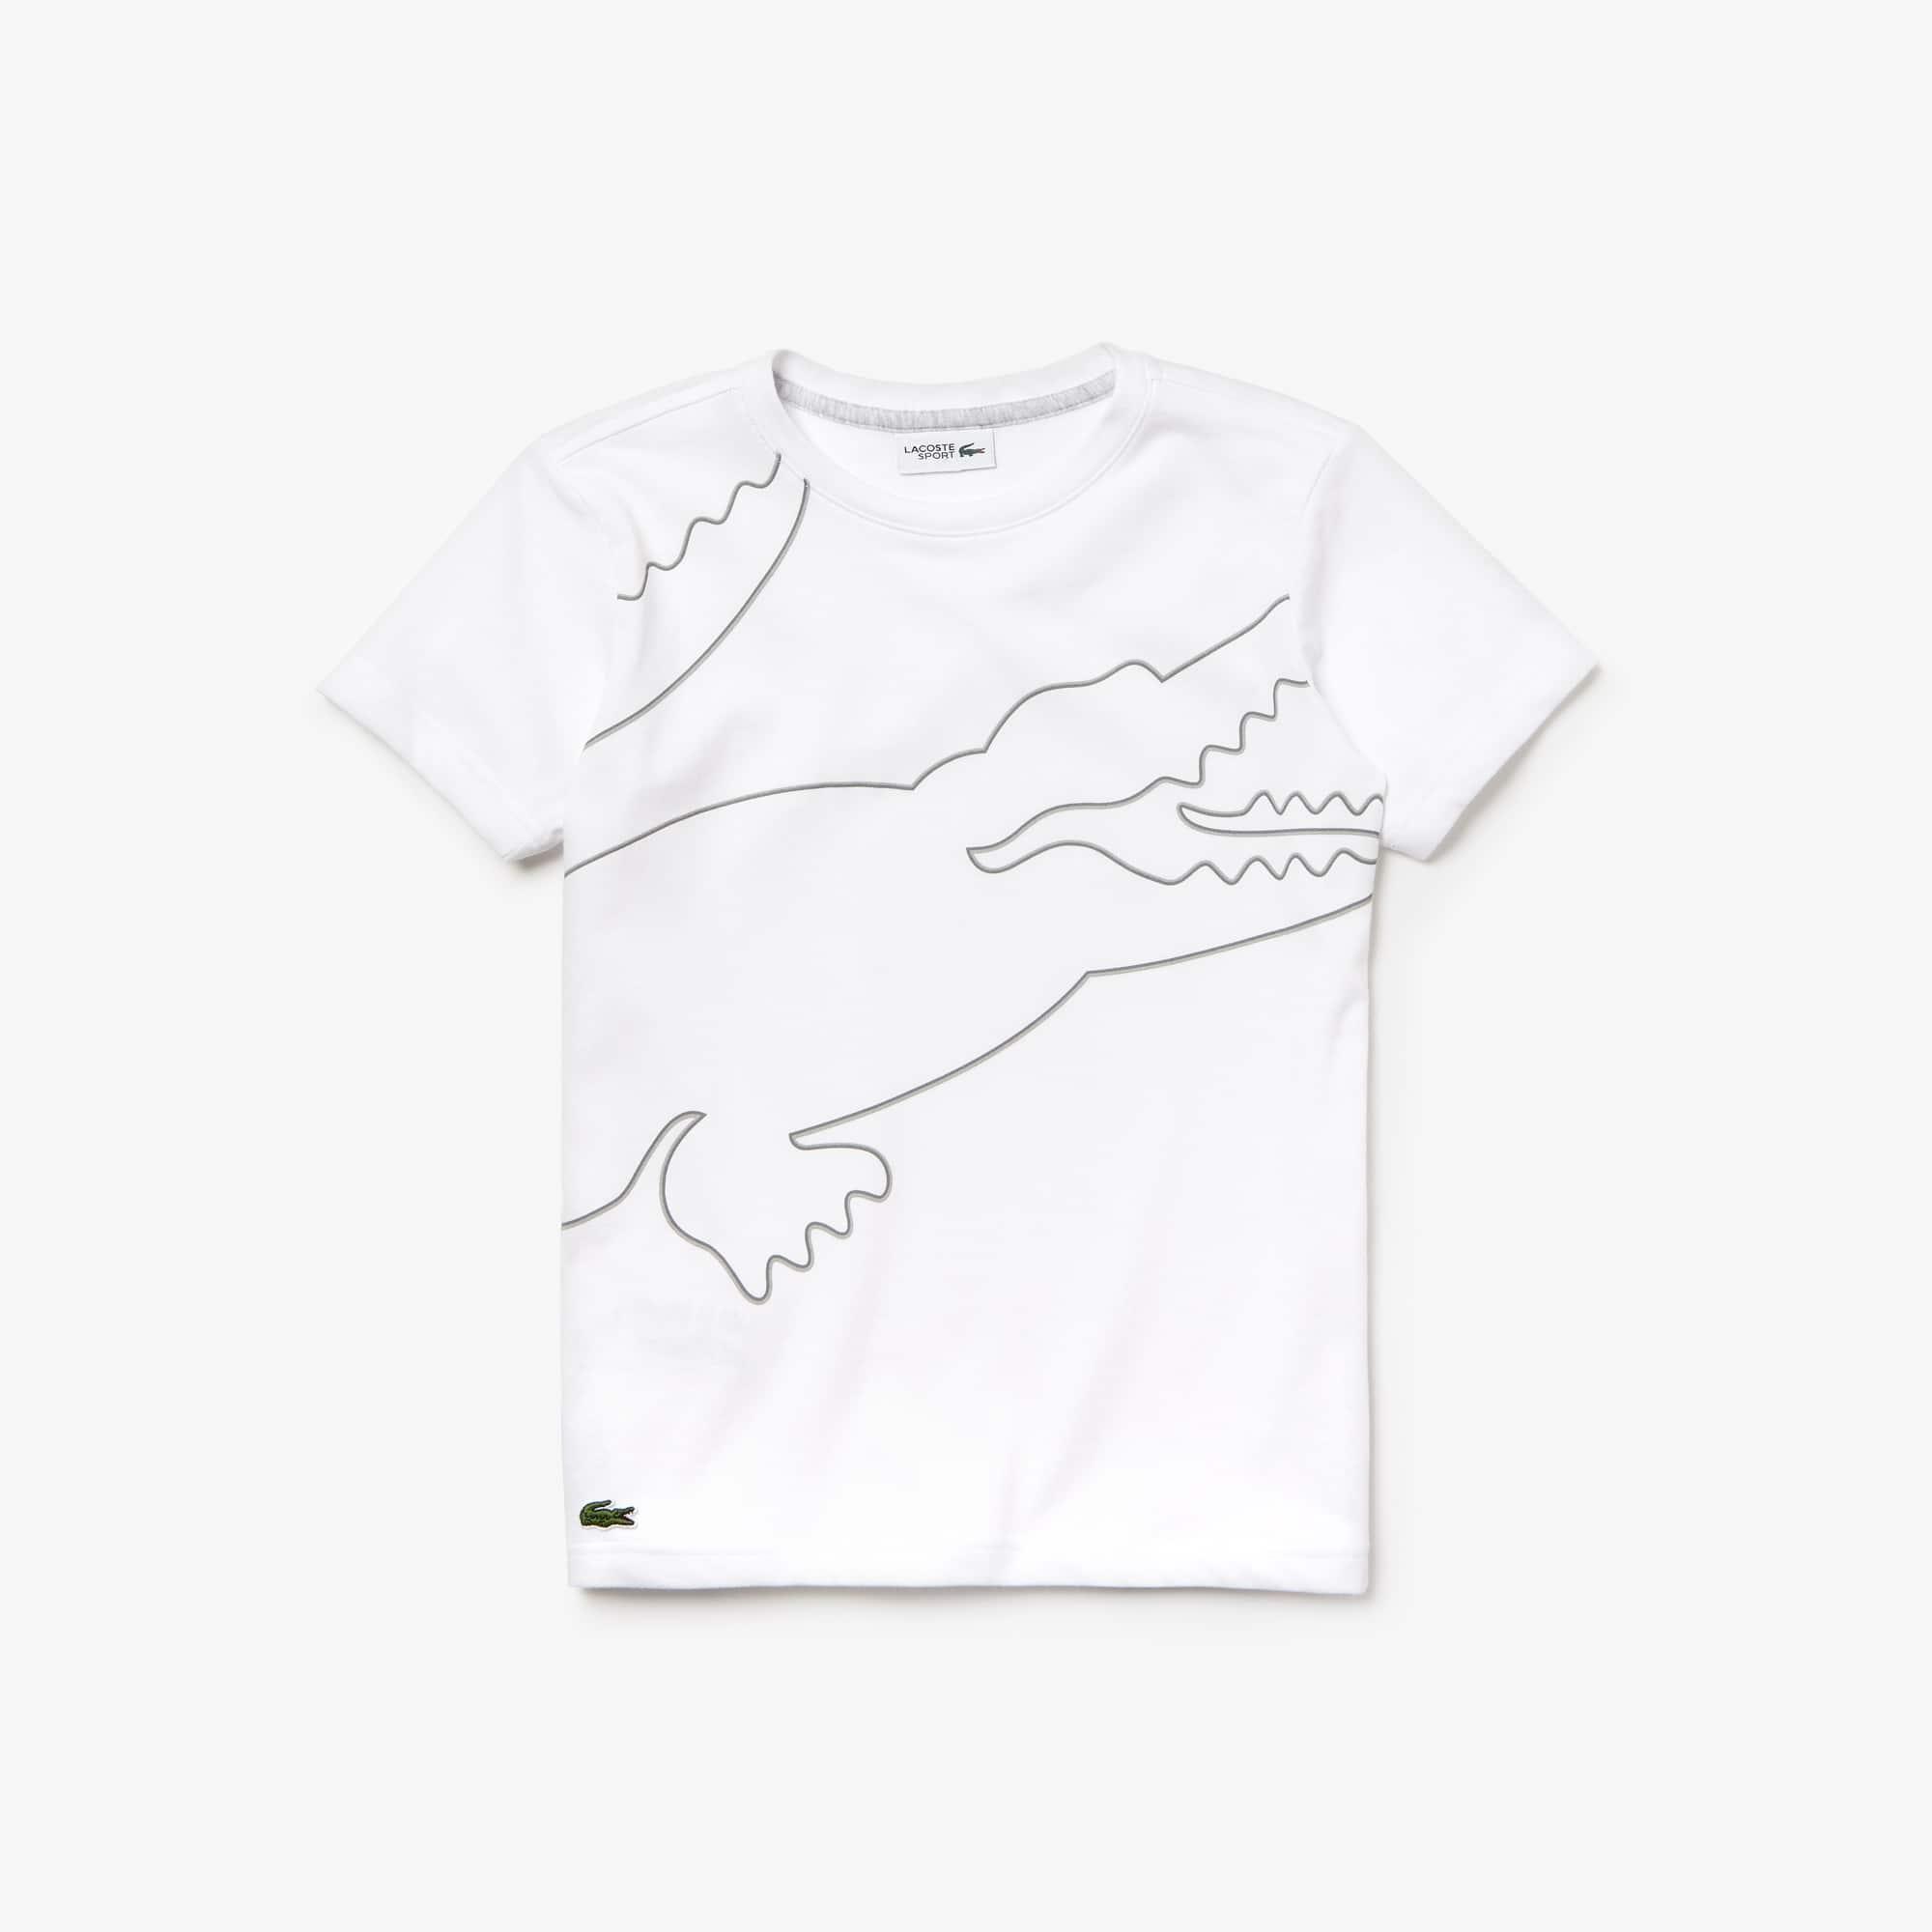 910176a6 Boys' Lacoste SPORT Crew Neck Oversized Croc Print Jersey T-shirt | LACOSTE